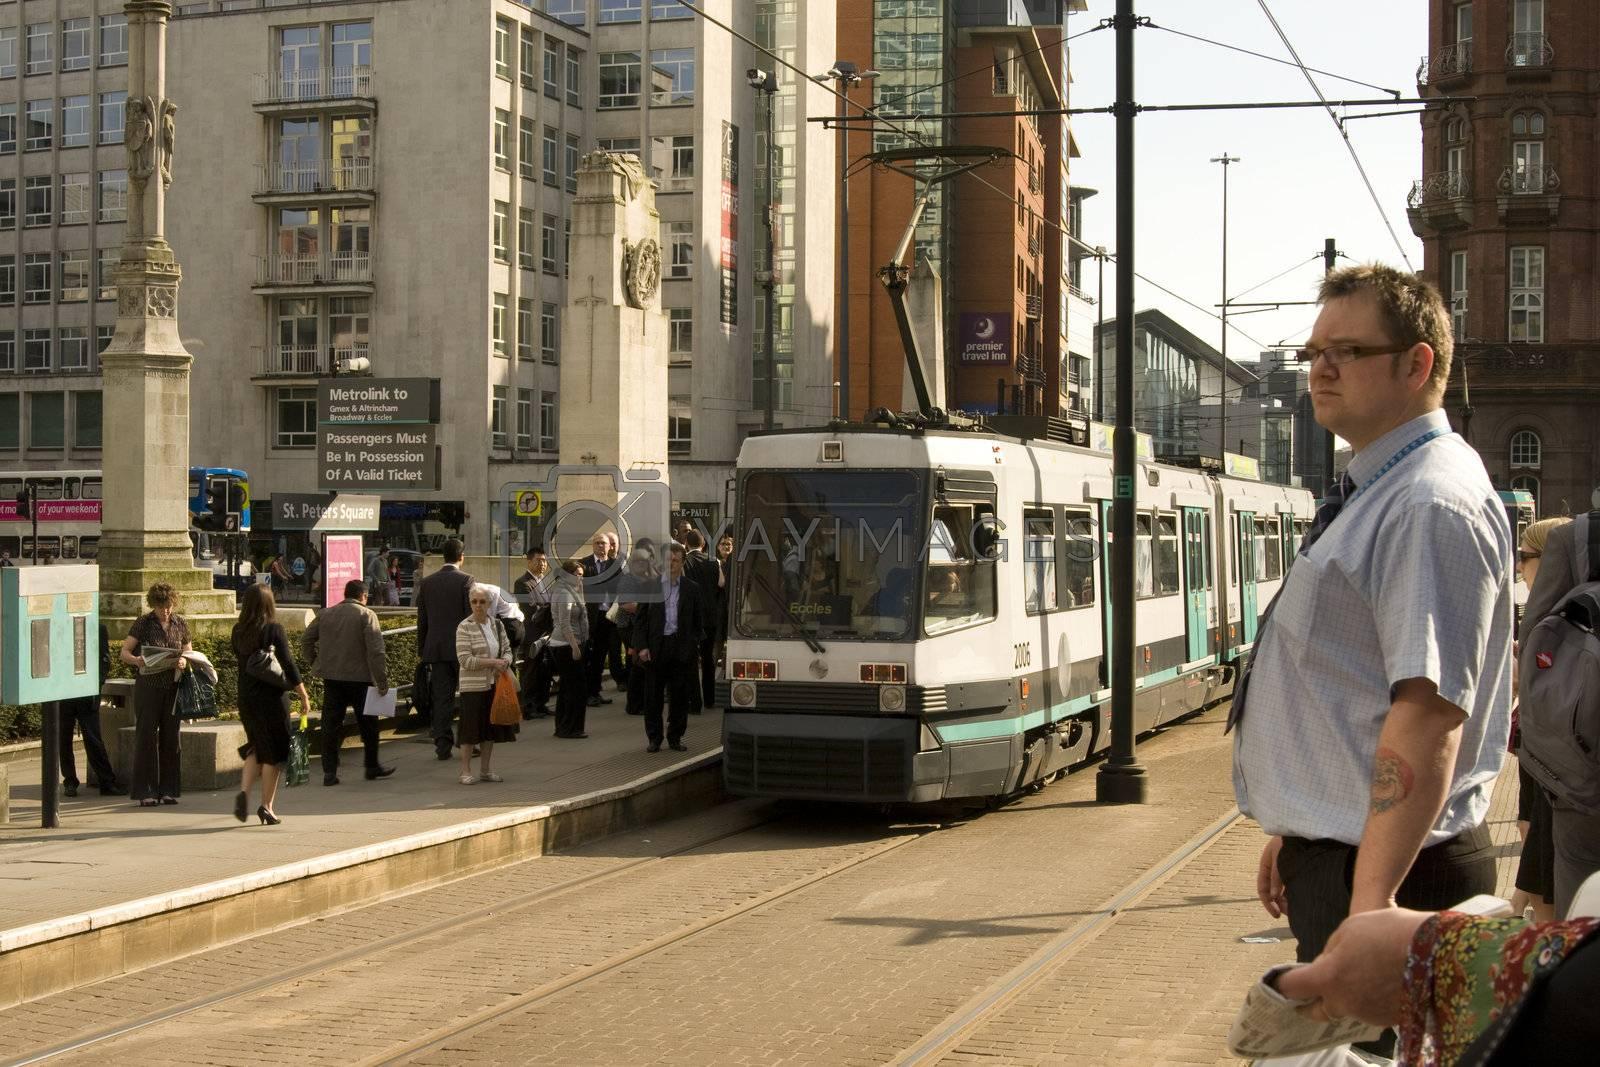 Metrolink tramway arriving at St Peter Square, Manchester,UK